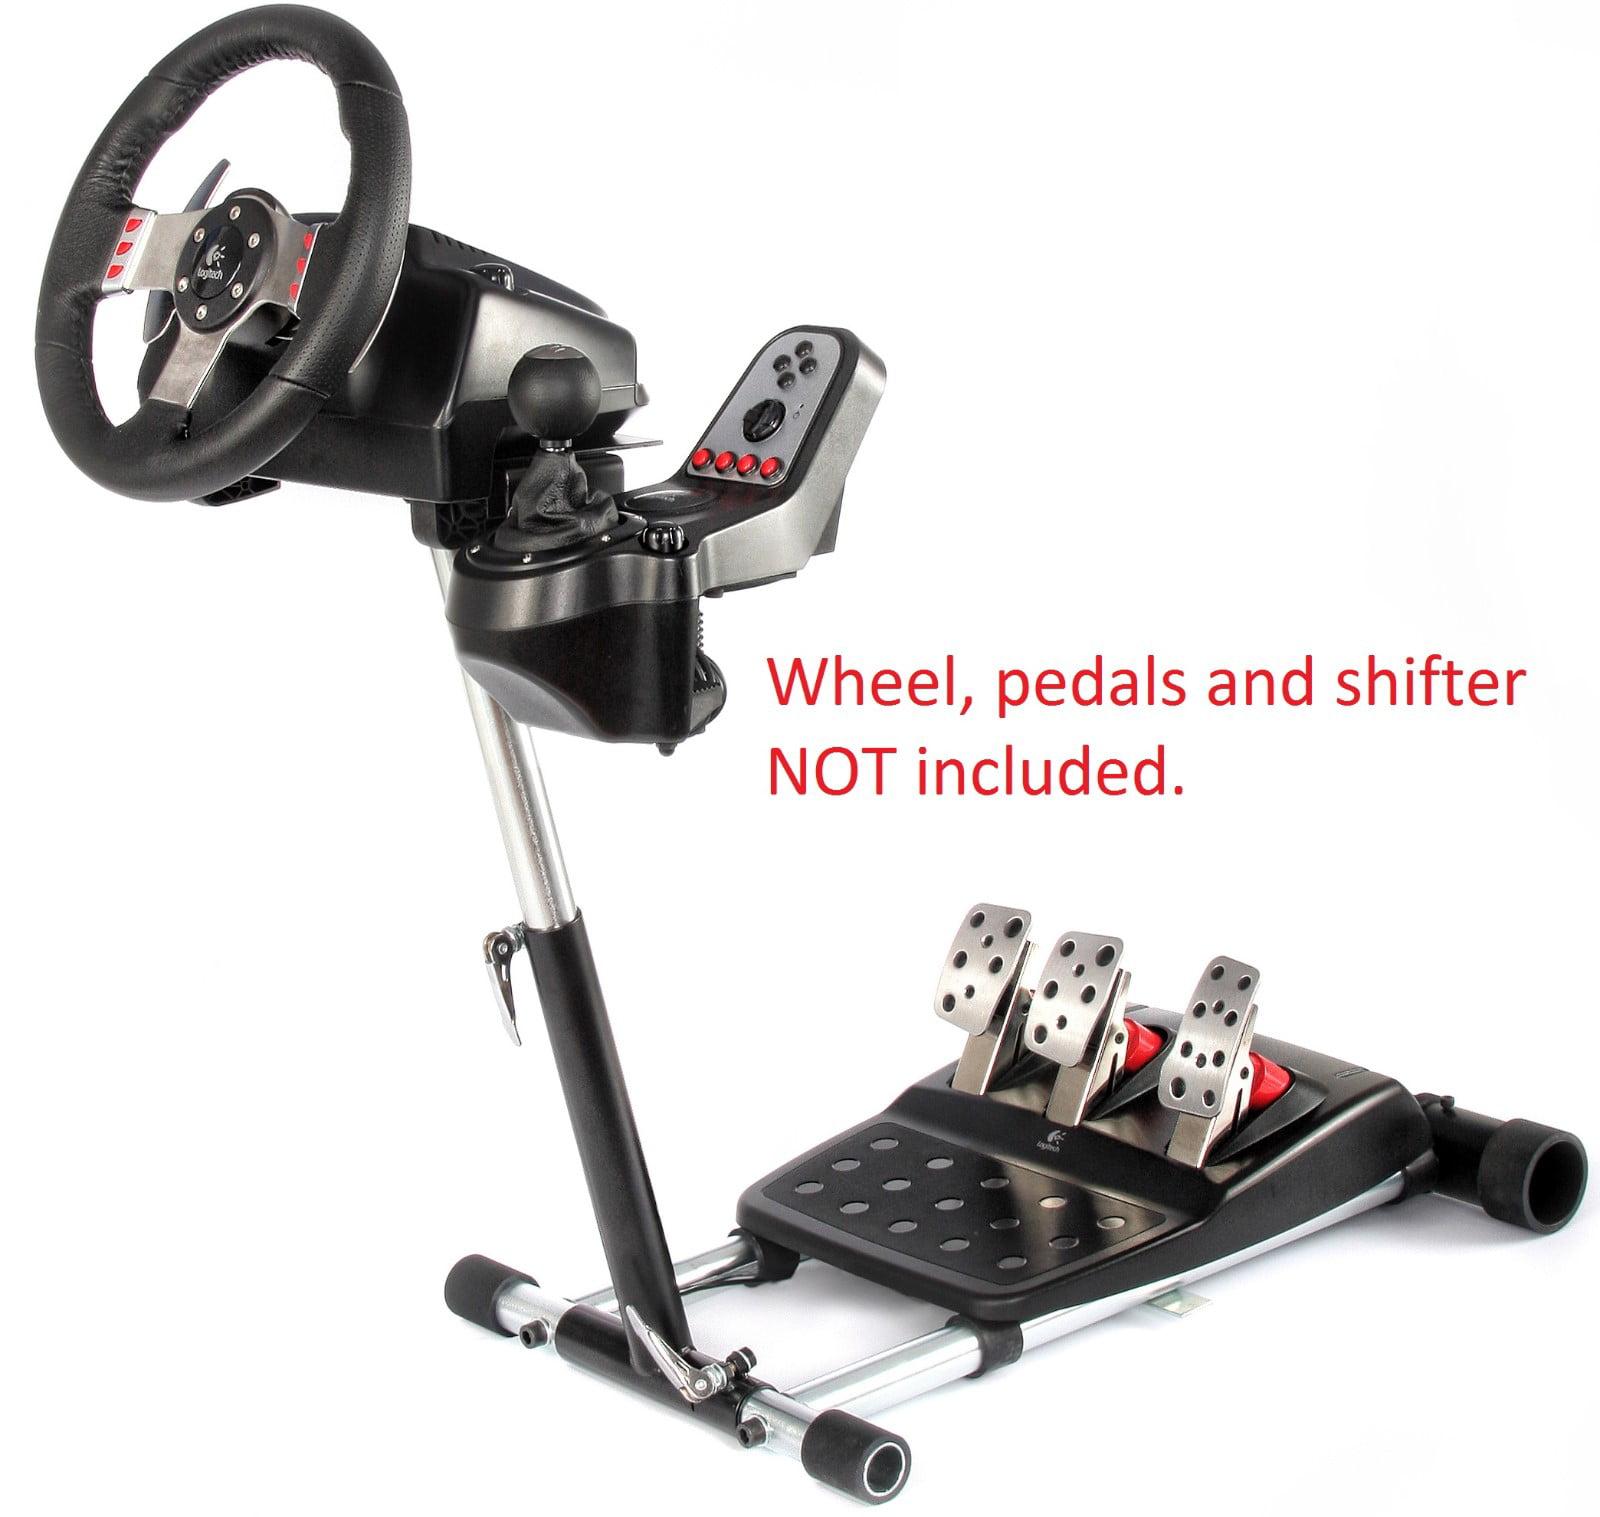 G29 Racing Steering Wheel Stand for Logitech G27/G25, G29...